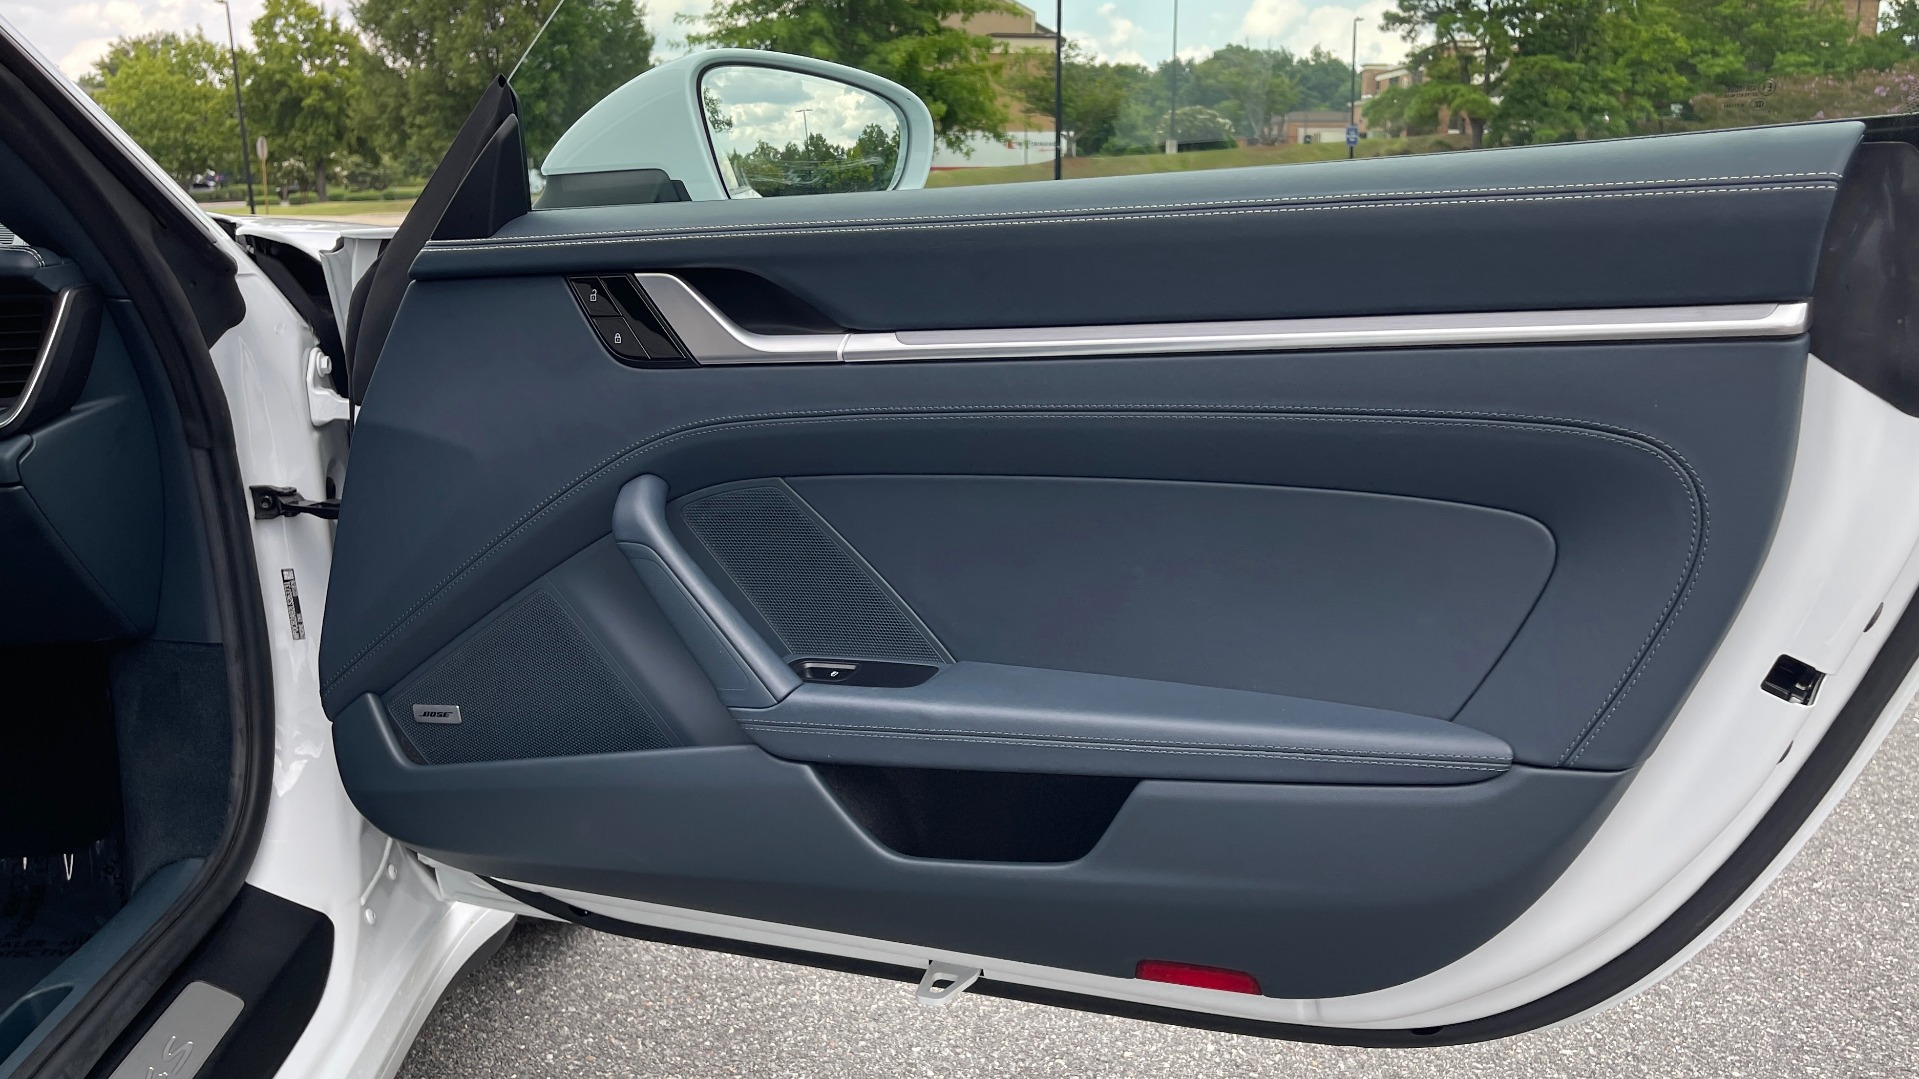 Used 2020 Porsche 911 CARRERA 4S CABRIOLET PREMIUM SPORT PKG / NAV / BOSE / LIGHT DESIGN PKG for sale $167,595 at Formula Imports in Charlotte NC 28227 71